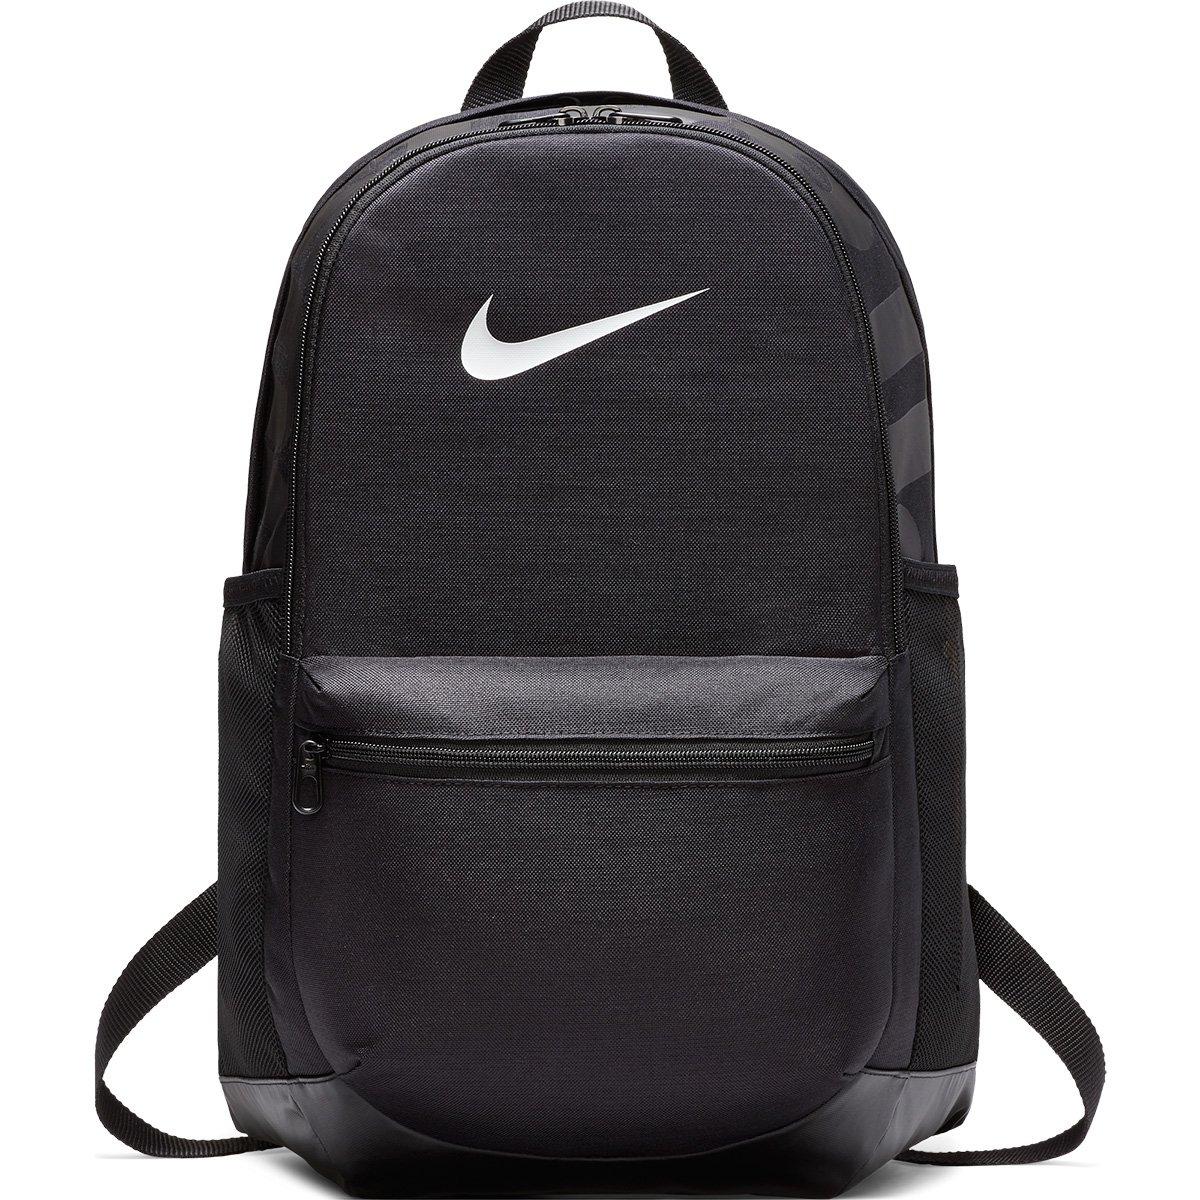 Mochila Nike Brasília b175c8c41a